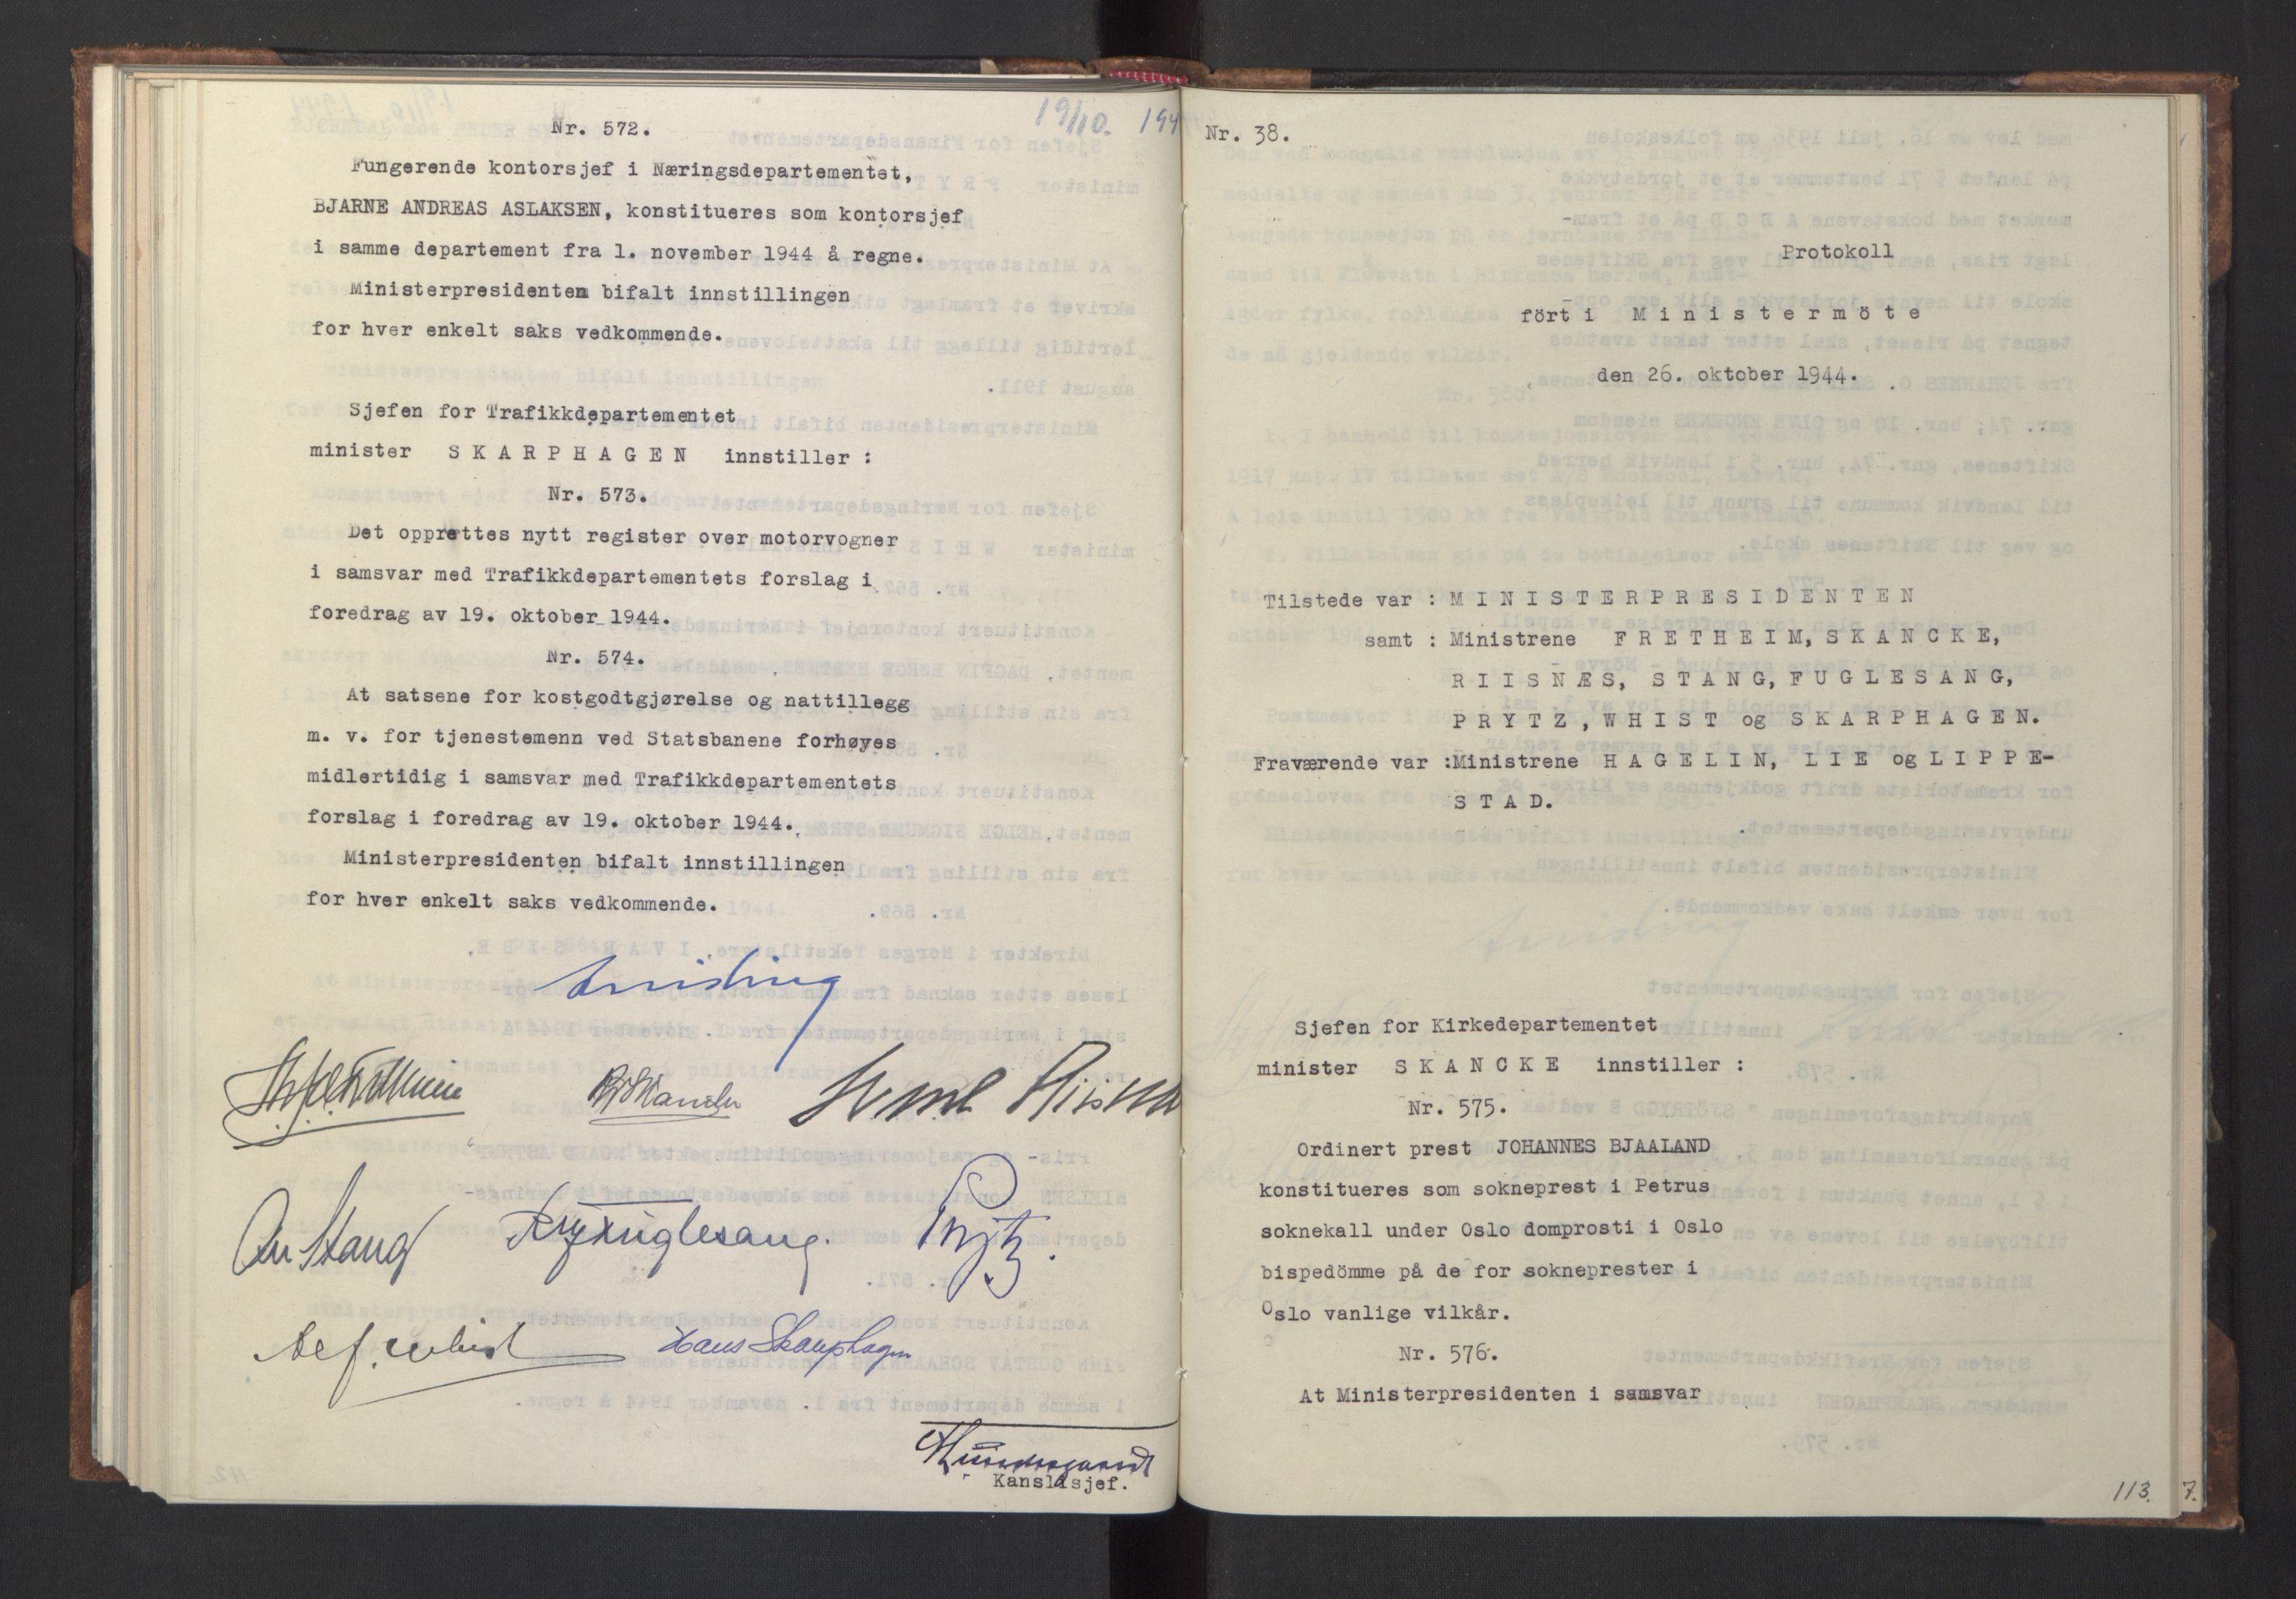 RA, NS-administrasjonen 1940-1945 (Statsrådsekretariatet, de kommisariske statsråder mm), D/Da/L0005: Protokoll fra ministermøter, 1944, s. 112b-113a